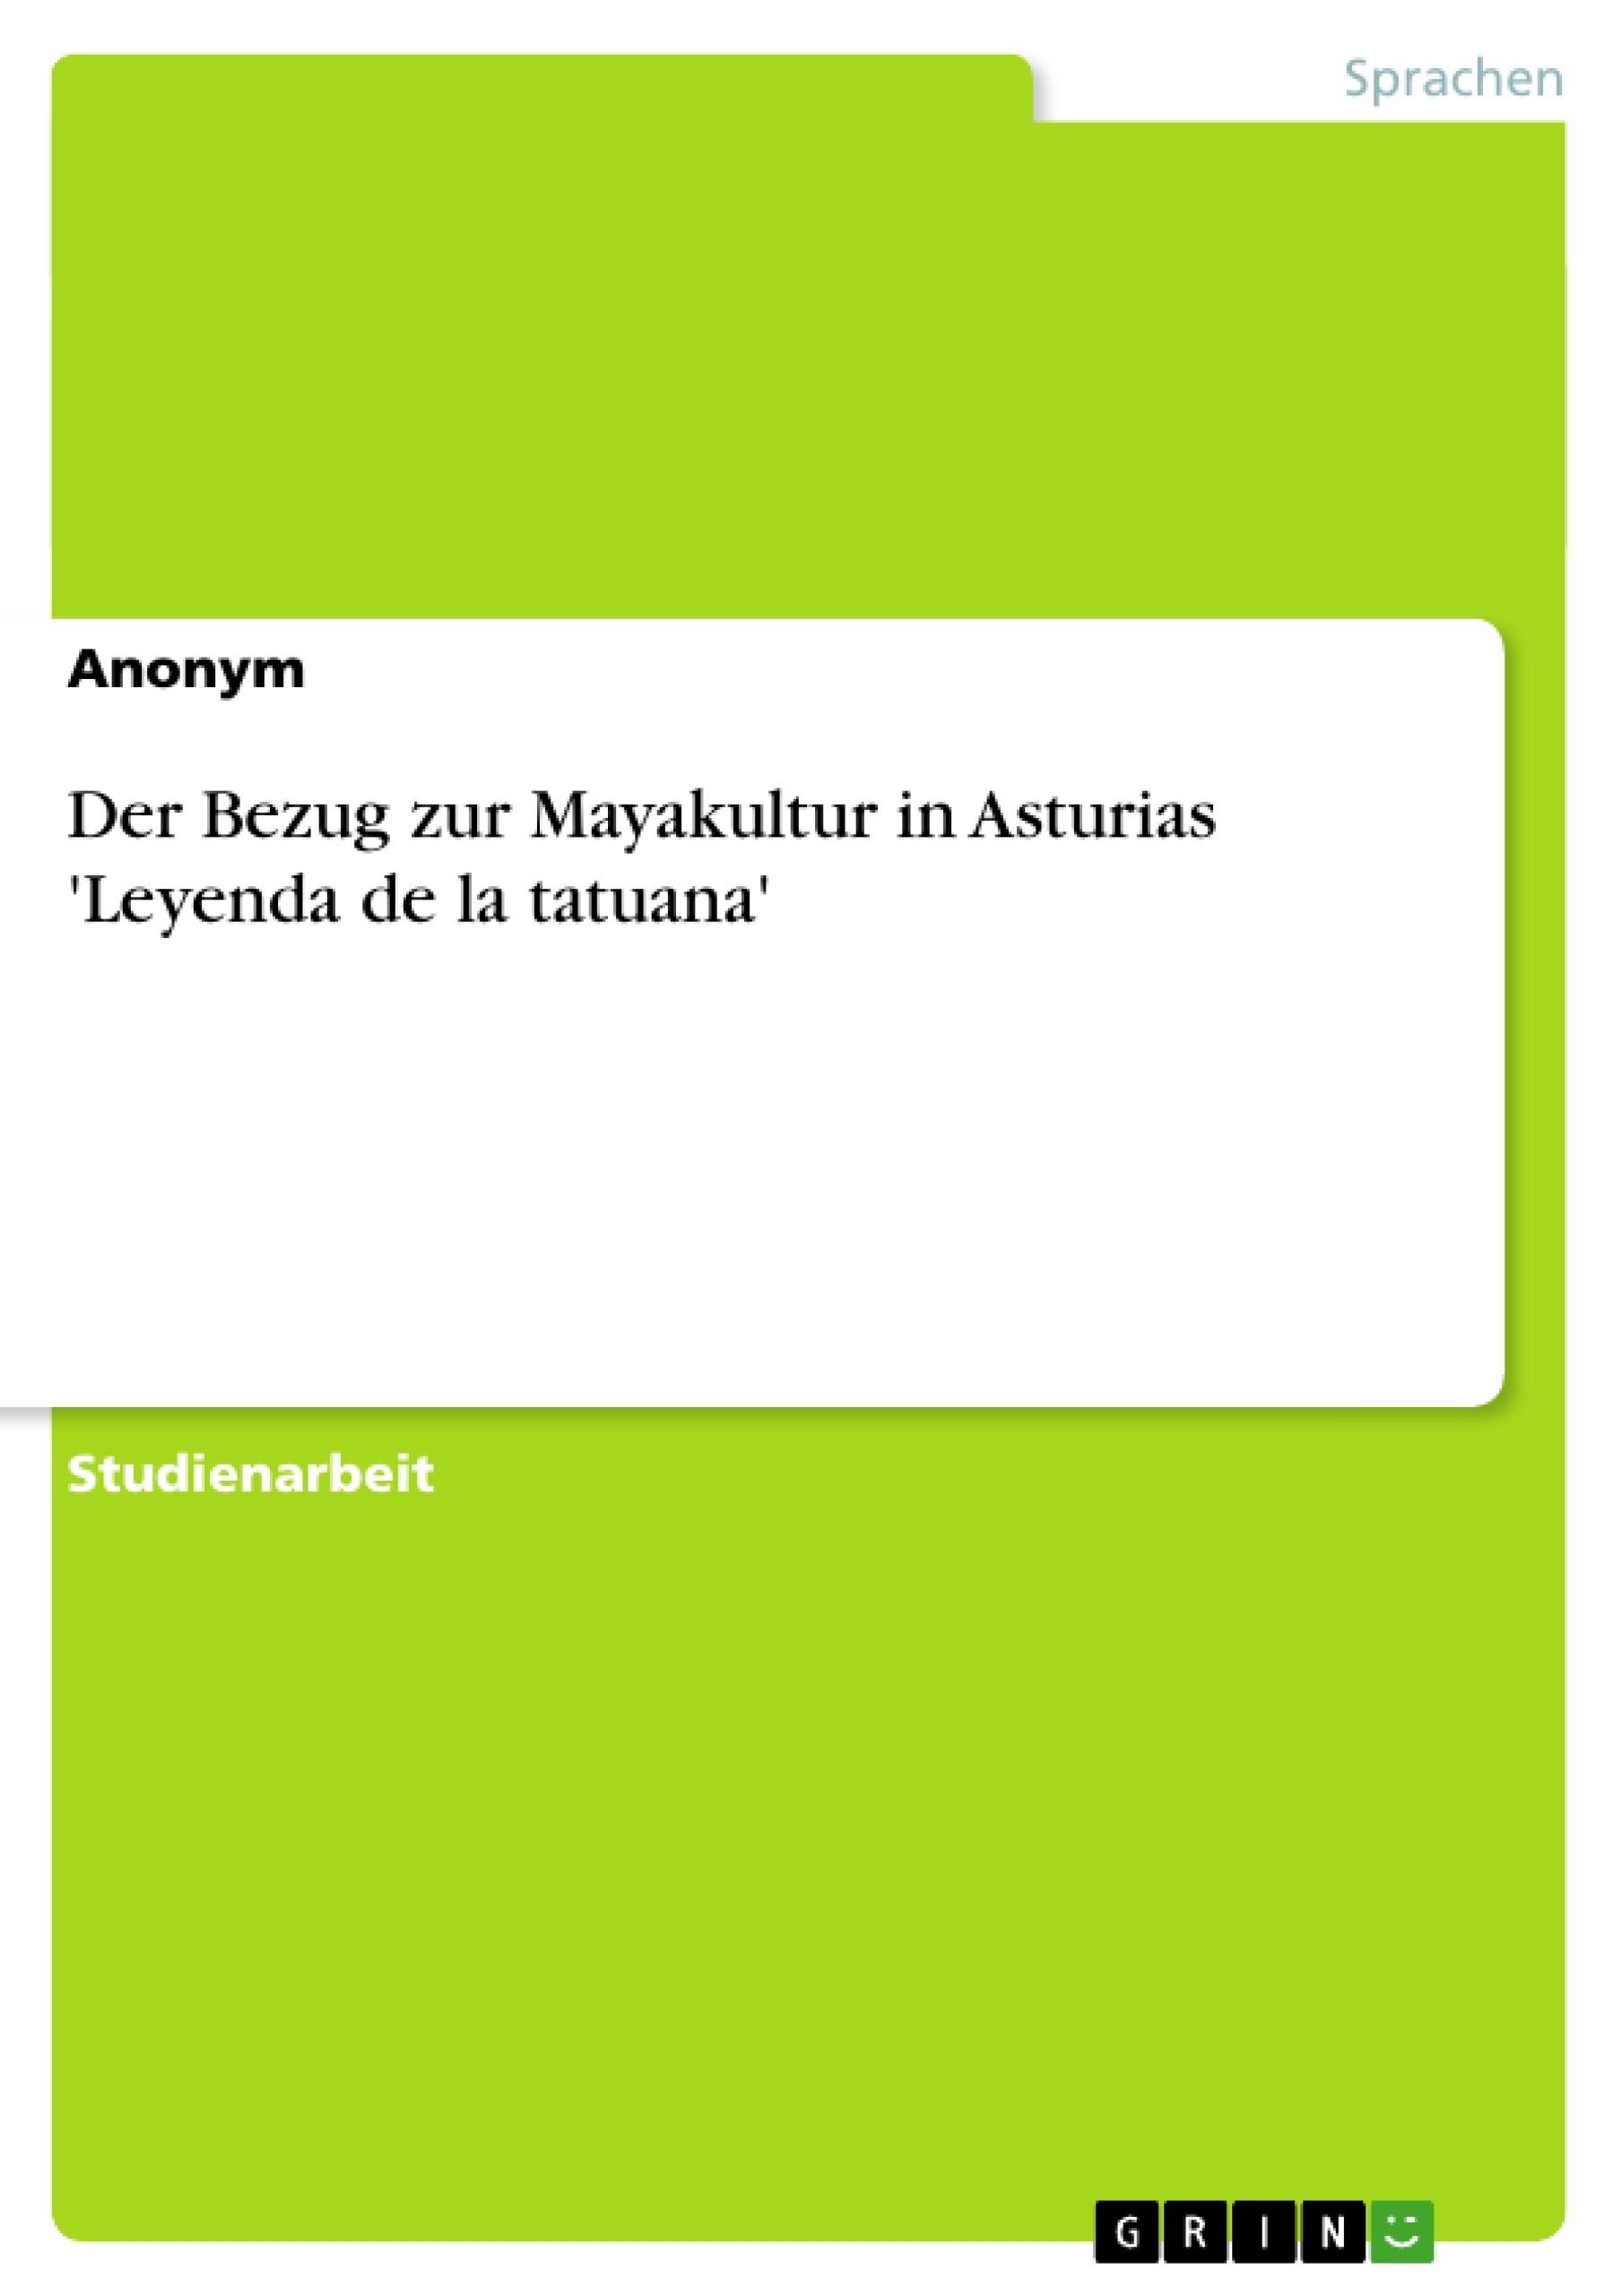 Titel: Der Bezug zur Mayakultur in Asturias 'Leyenda de la tatuana'